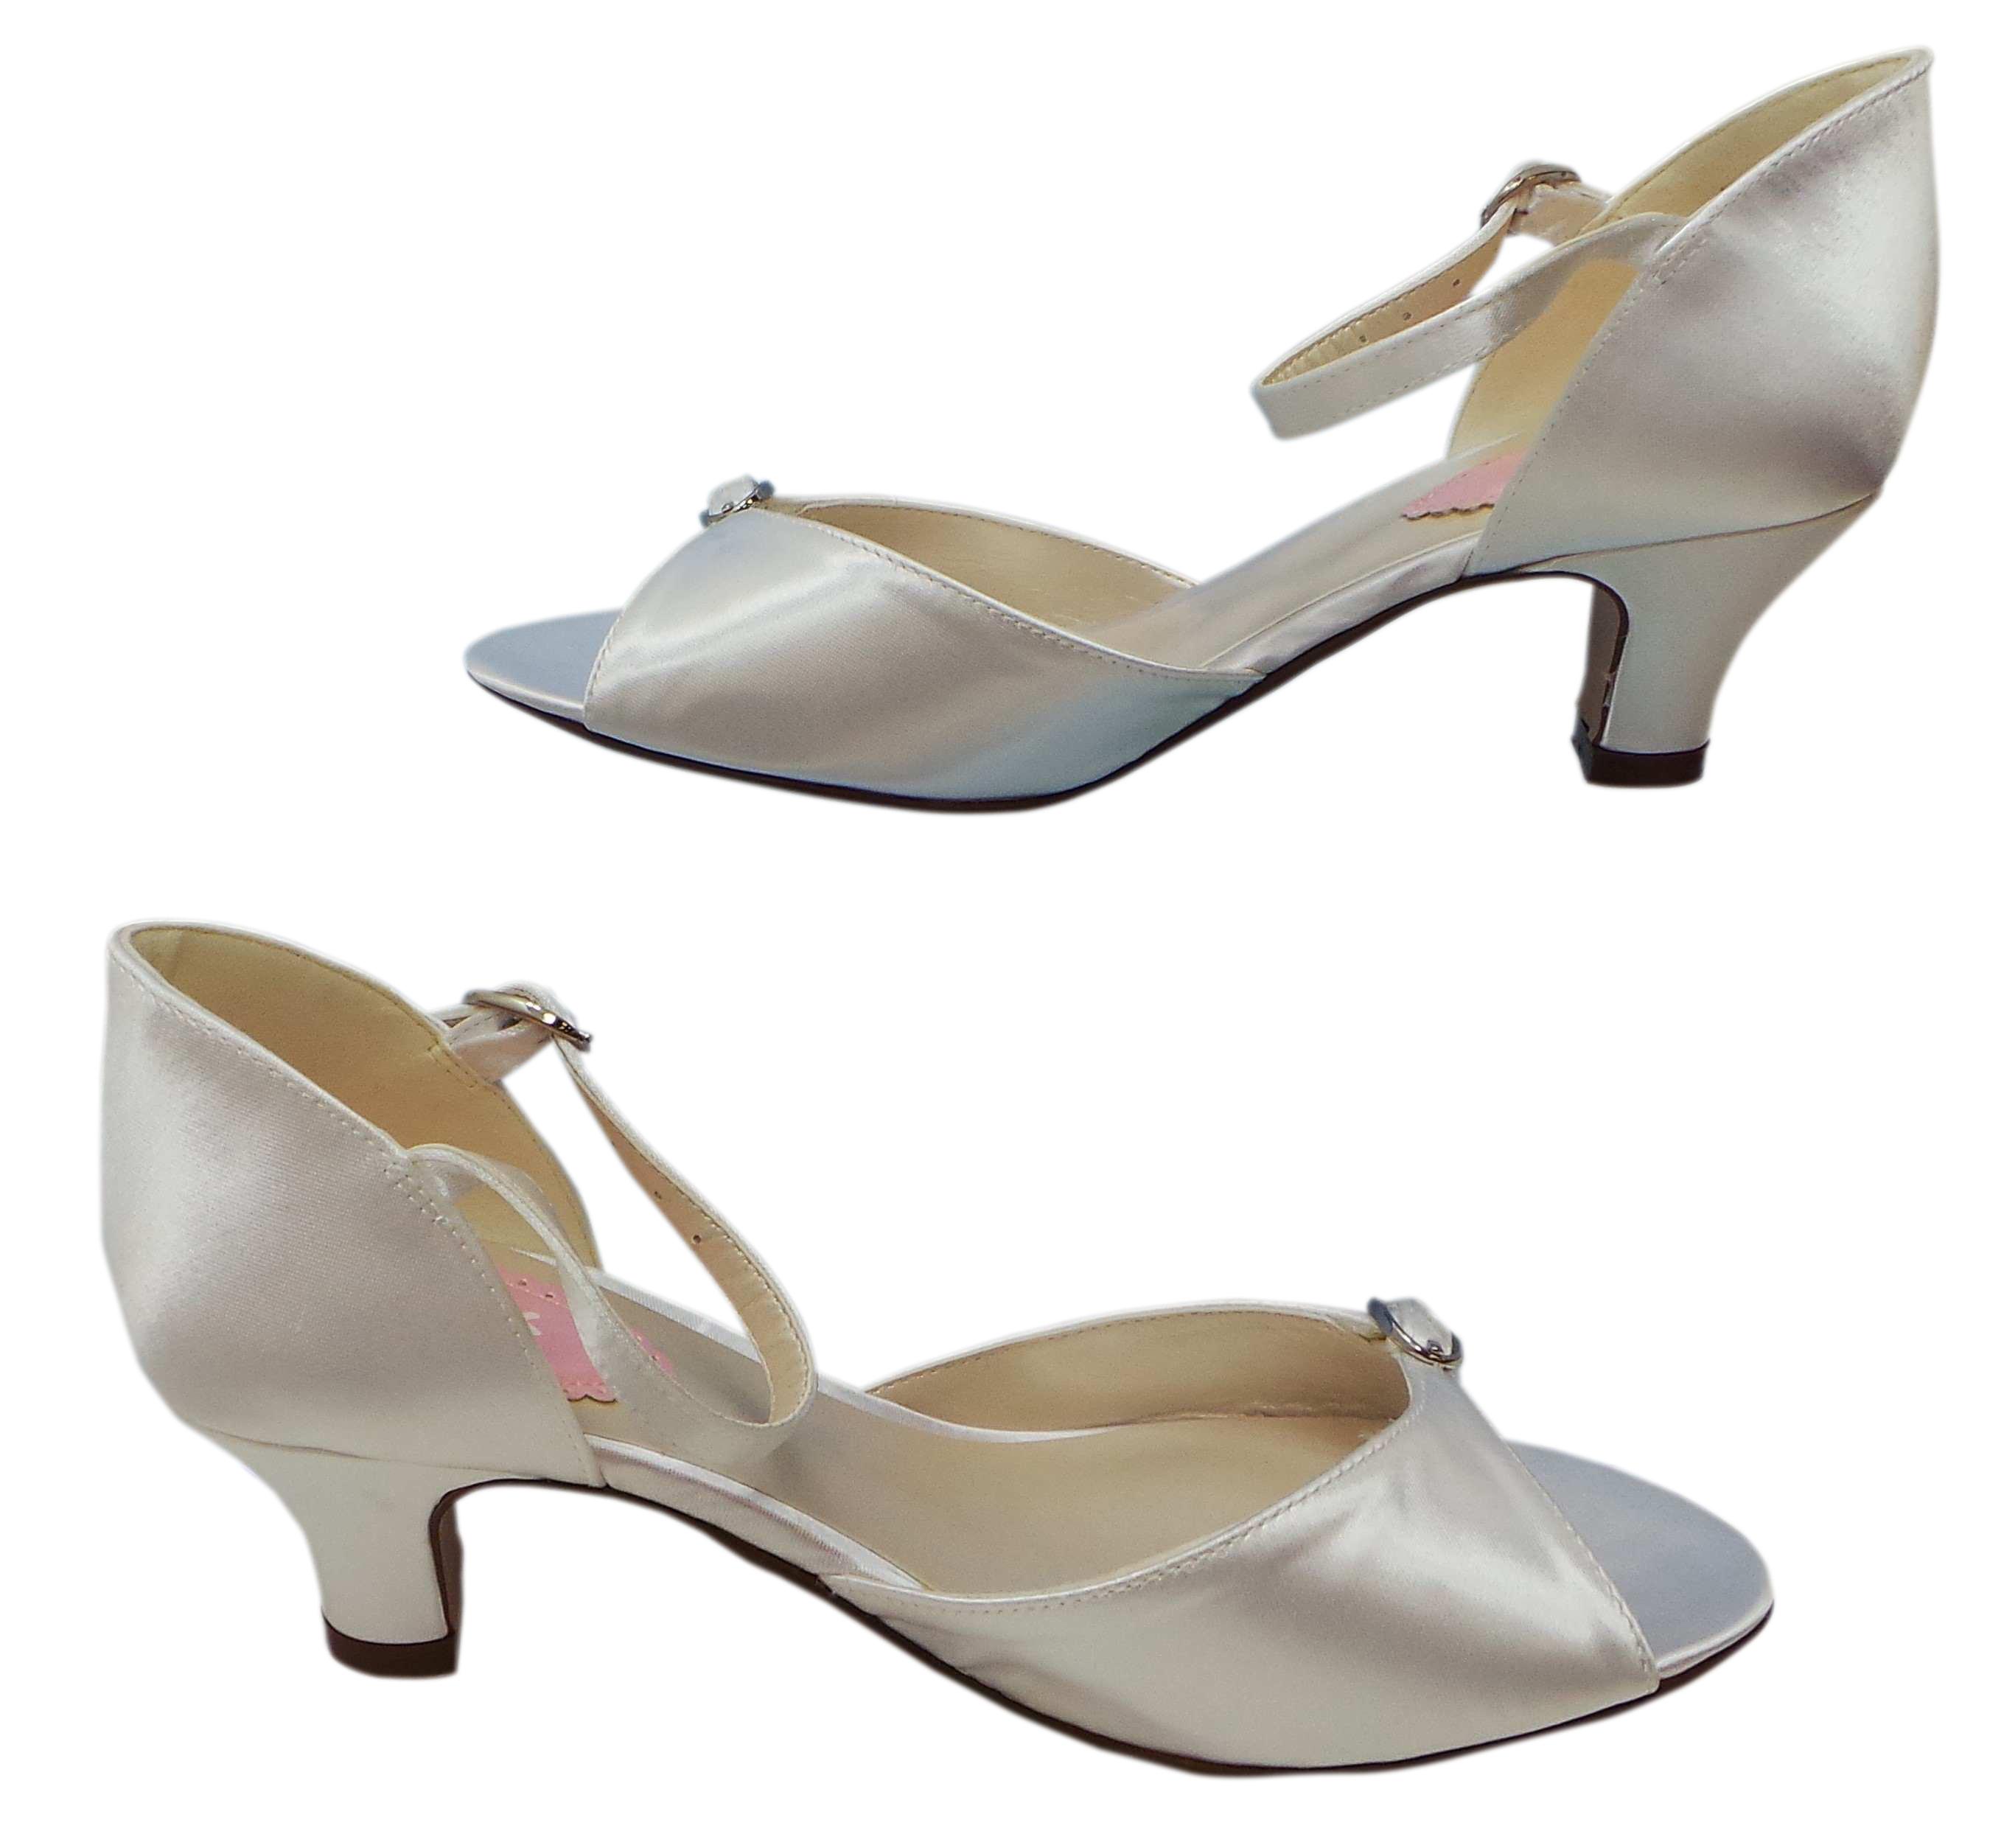 joblot of 10 paradox pink cherub white satin heeled